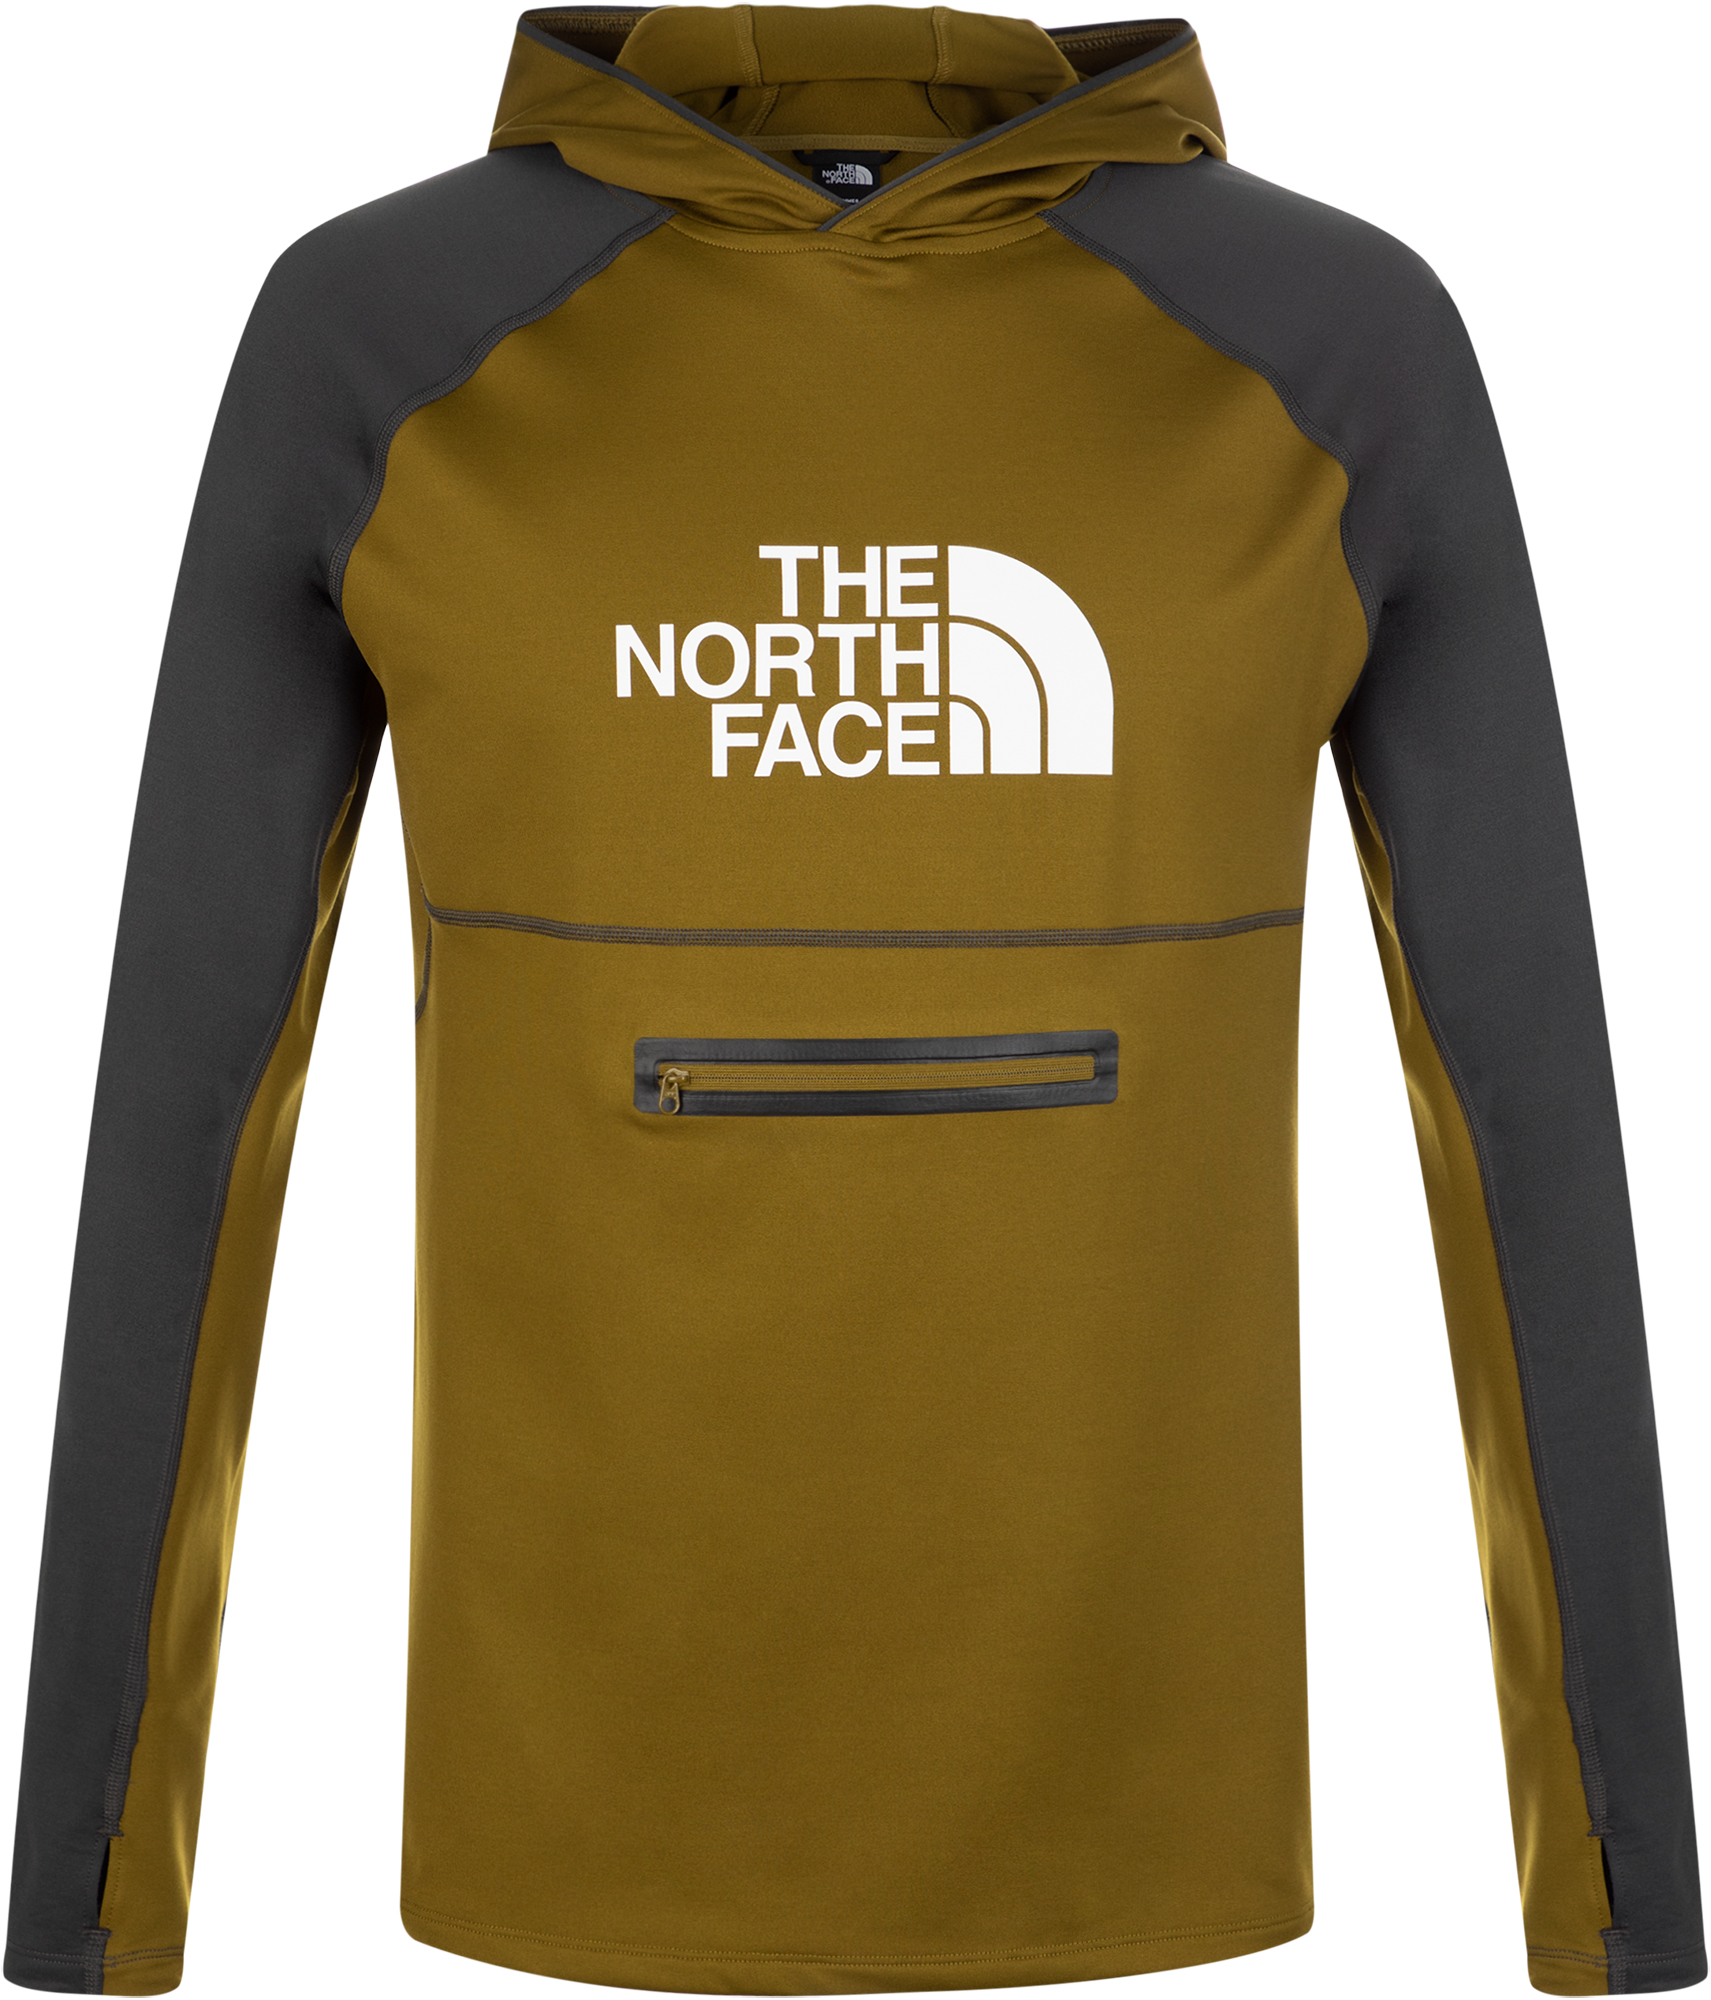 The North Face Худи мужская The North Face Varuna, размер 46 худи print bar the clash